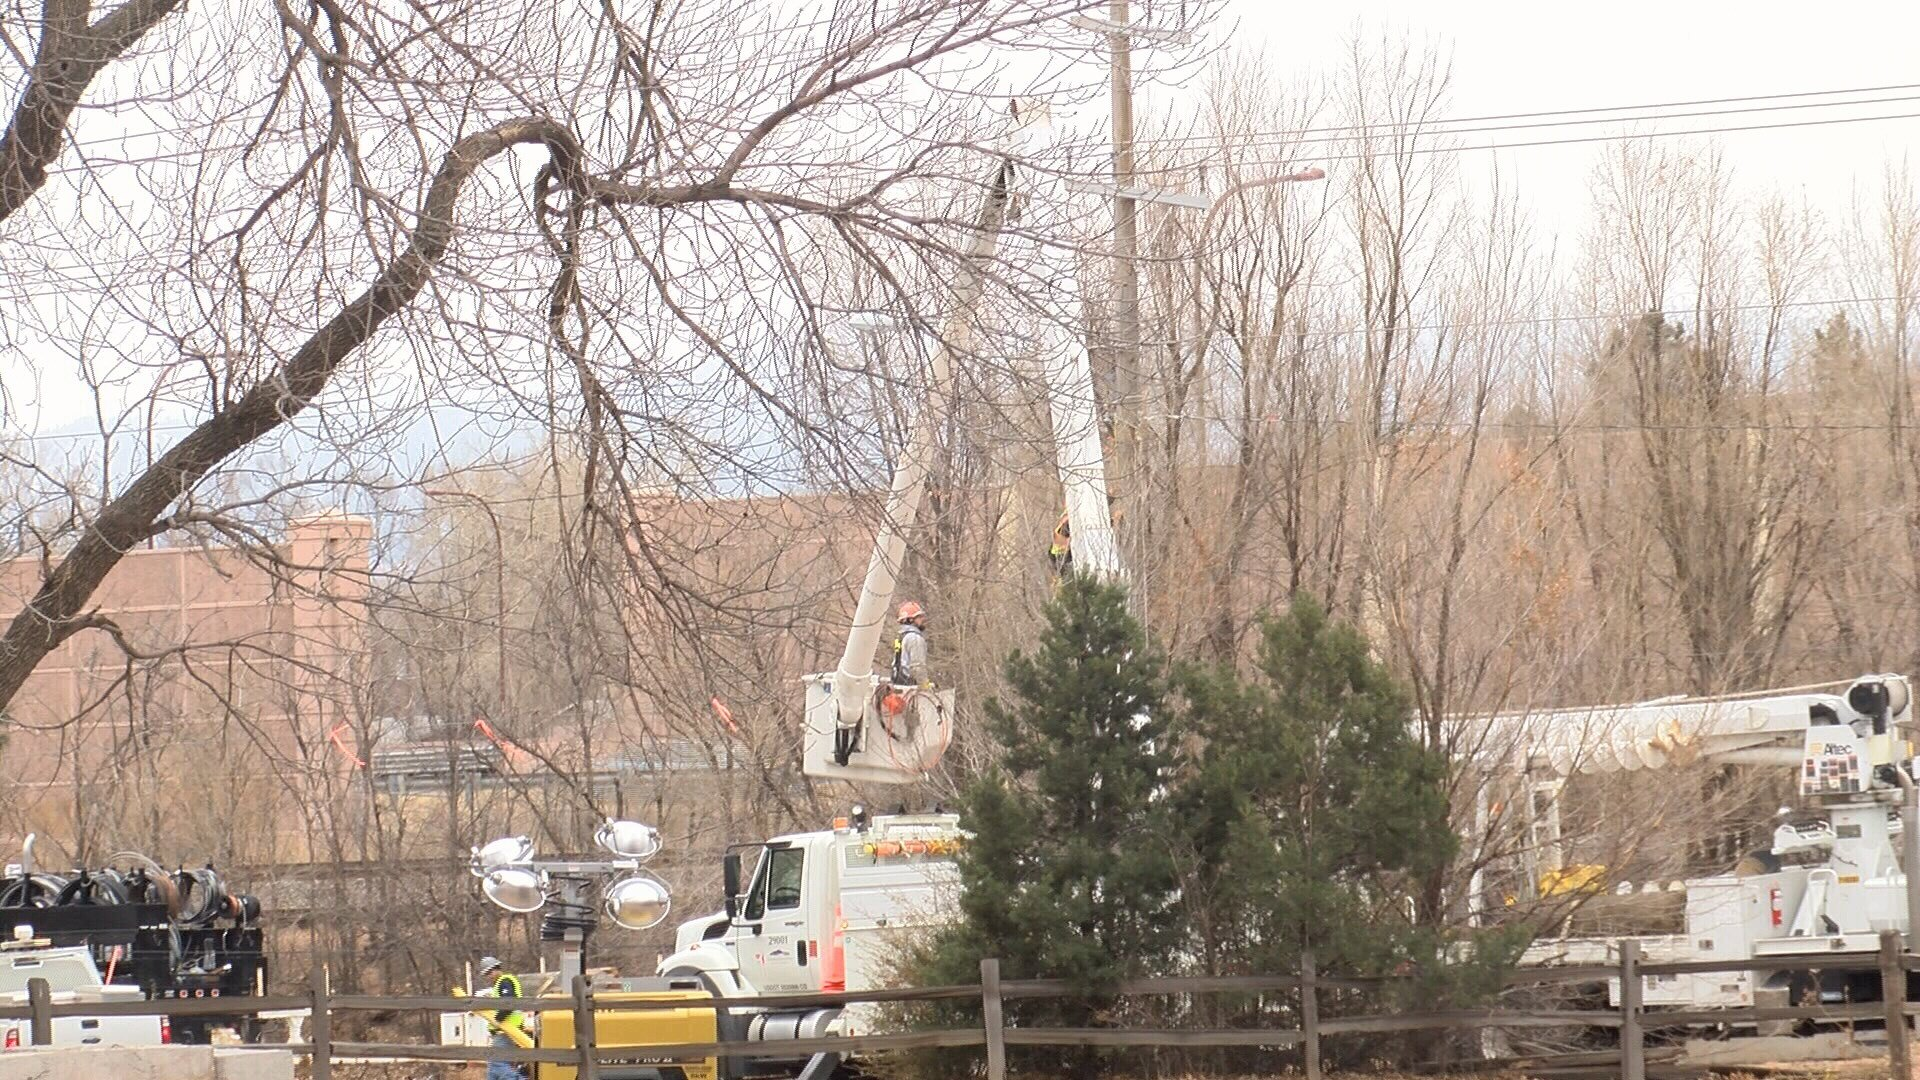 Colorado Springs Utilities crews work to restore power on Glen Ave. following a fatal crash. (KOAA)